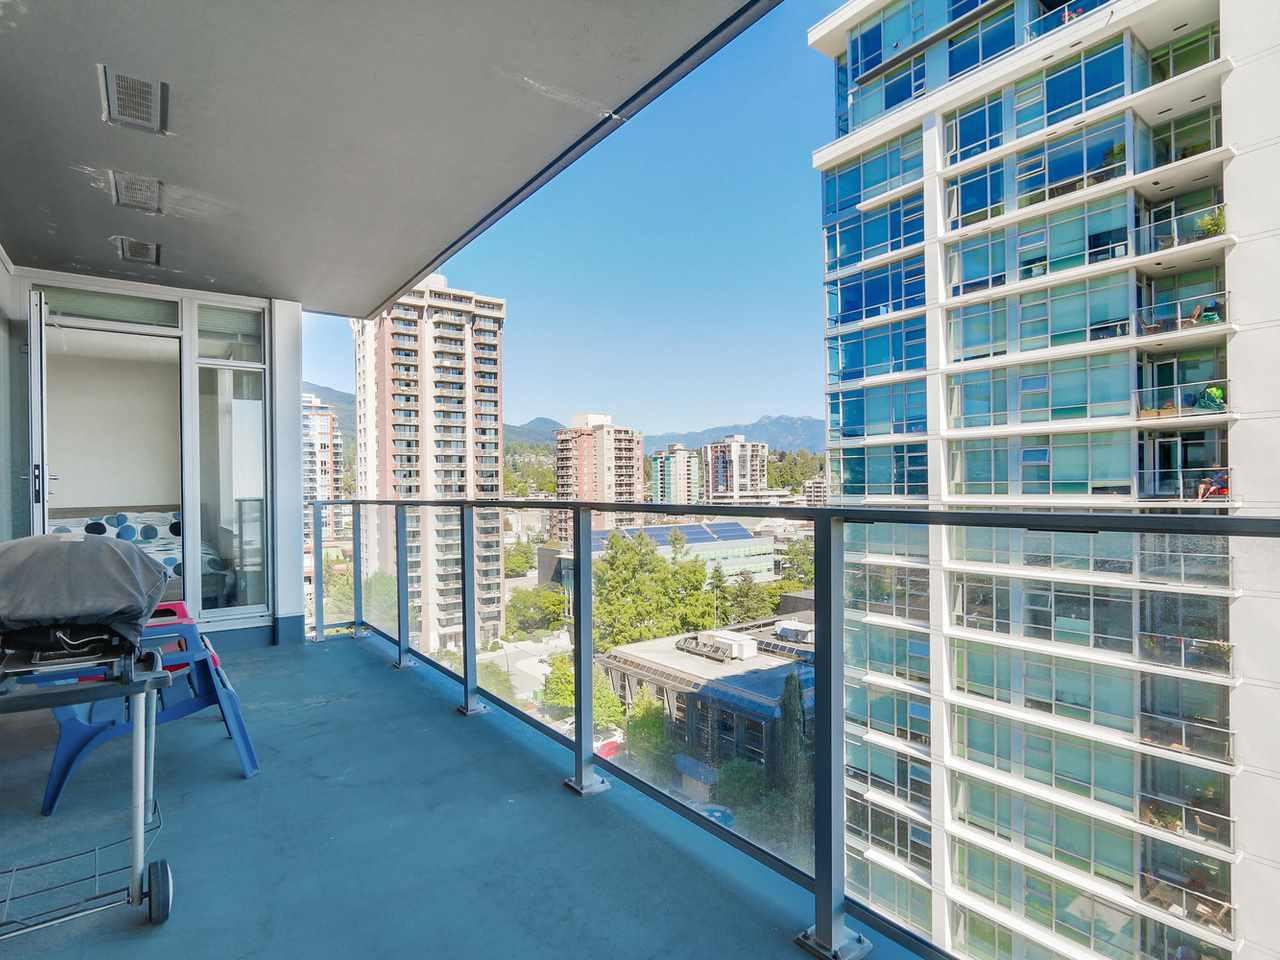 Condo Apartment at 1201 1320 CHESTERFIELD AVENUE, Unit 1201, North Vancouver, British Columbia. Image 12